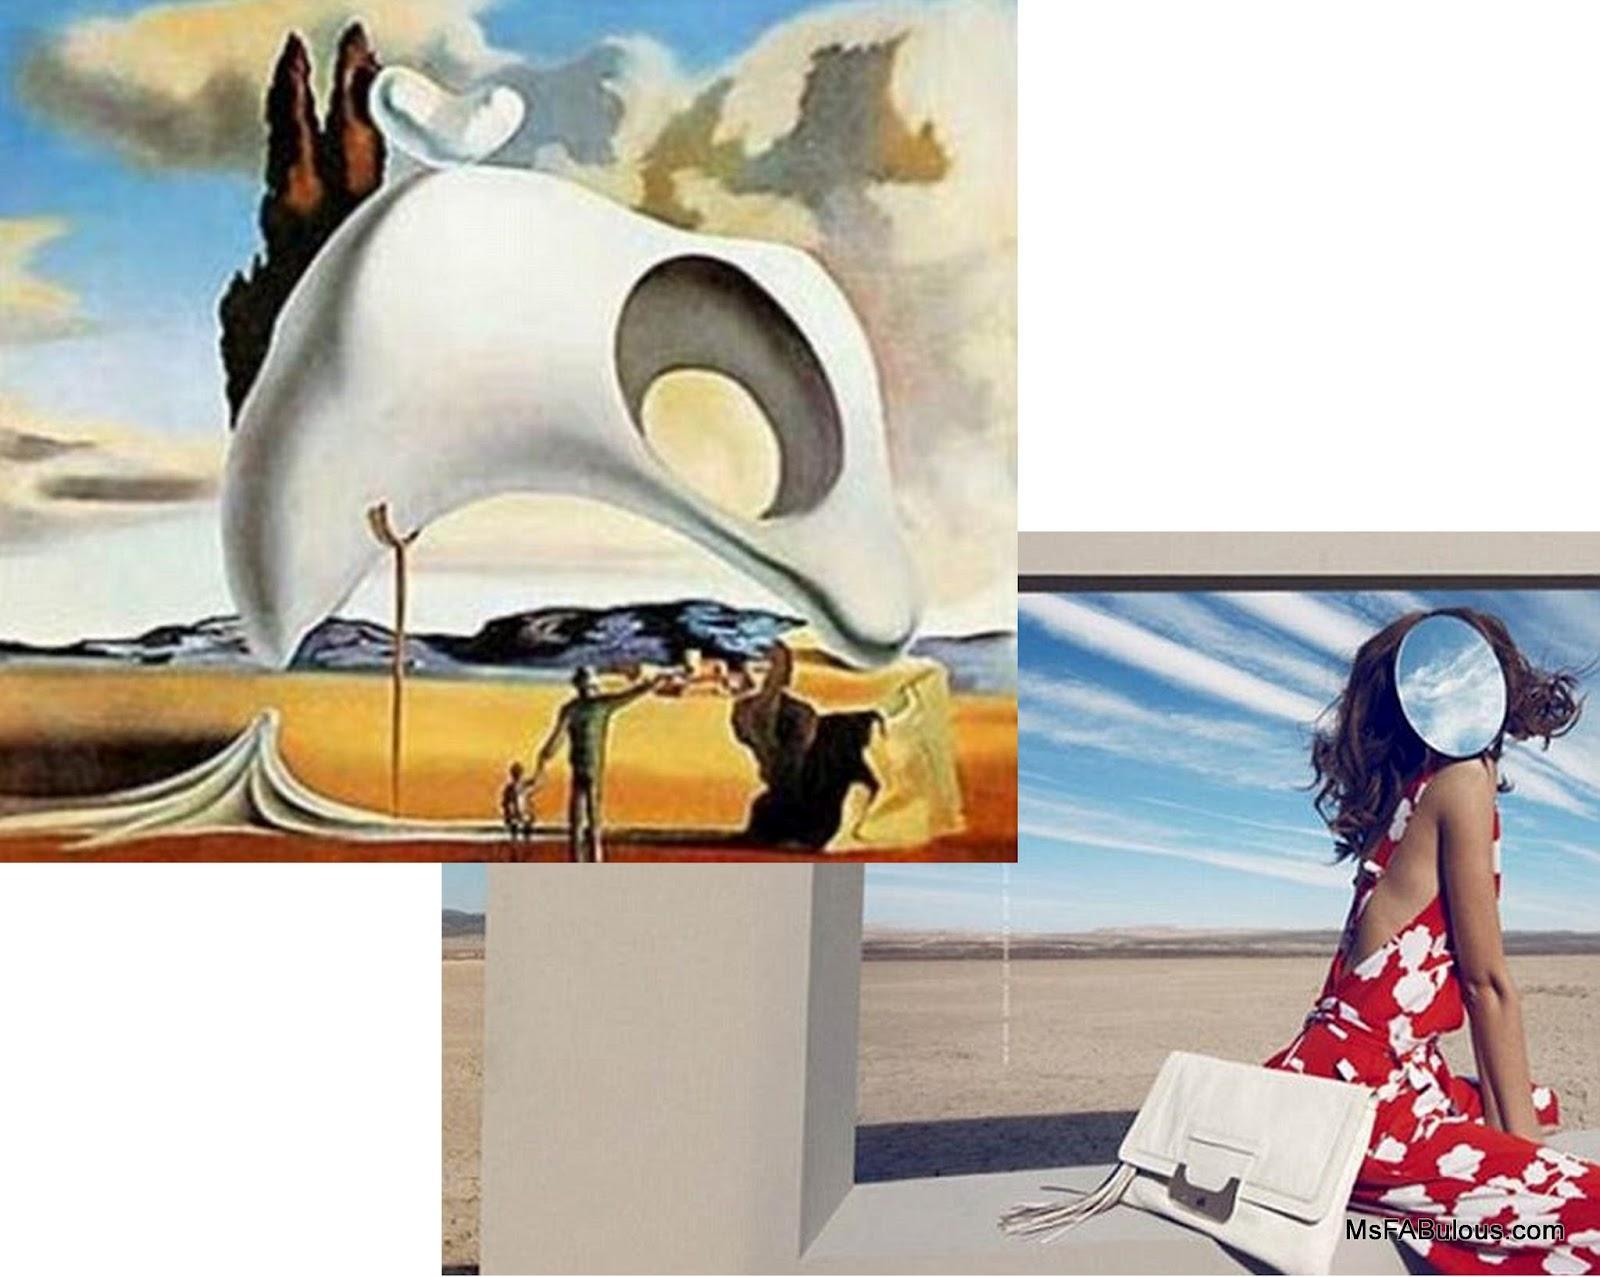 http://1.bp.blogspot.com/-tvQx1vDH7O4/UEBRVztOWSI/AAAAAAAANpc/rlAiaEvKVY0/s1600/Schiaparelli+Prada+exhibit3-002.jpg